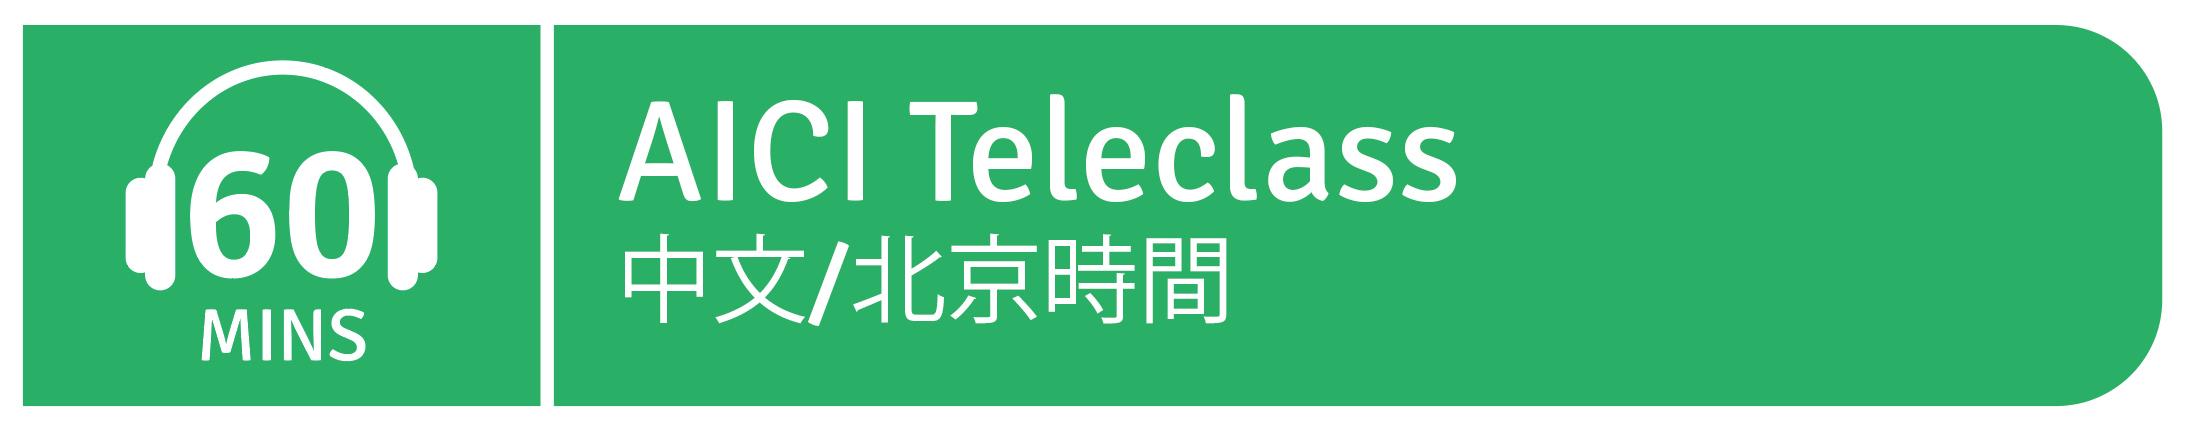 Japanese Teleclass